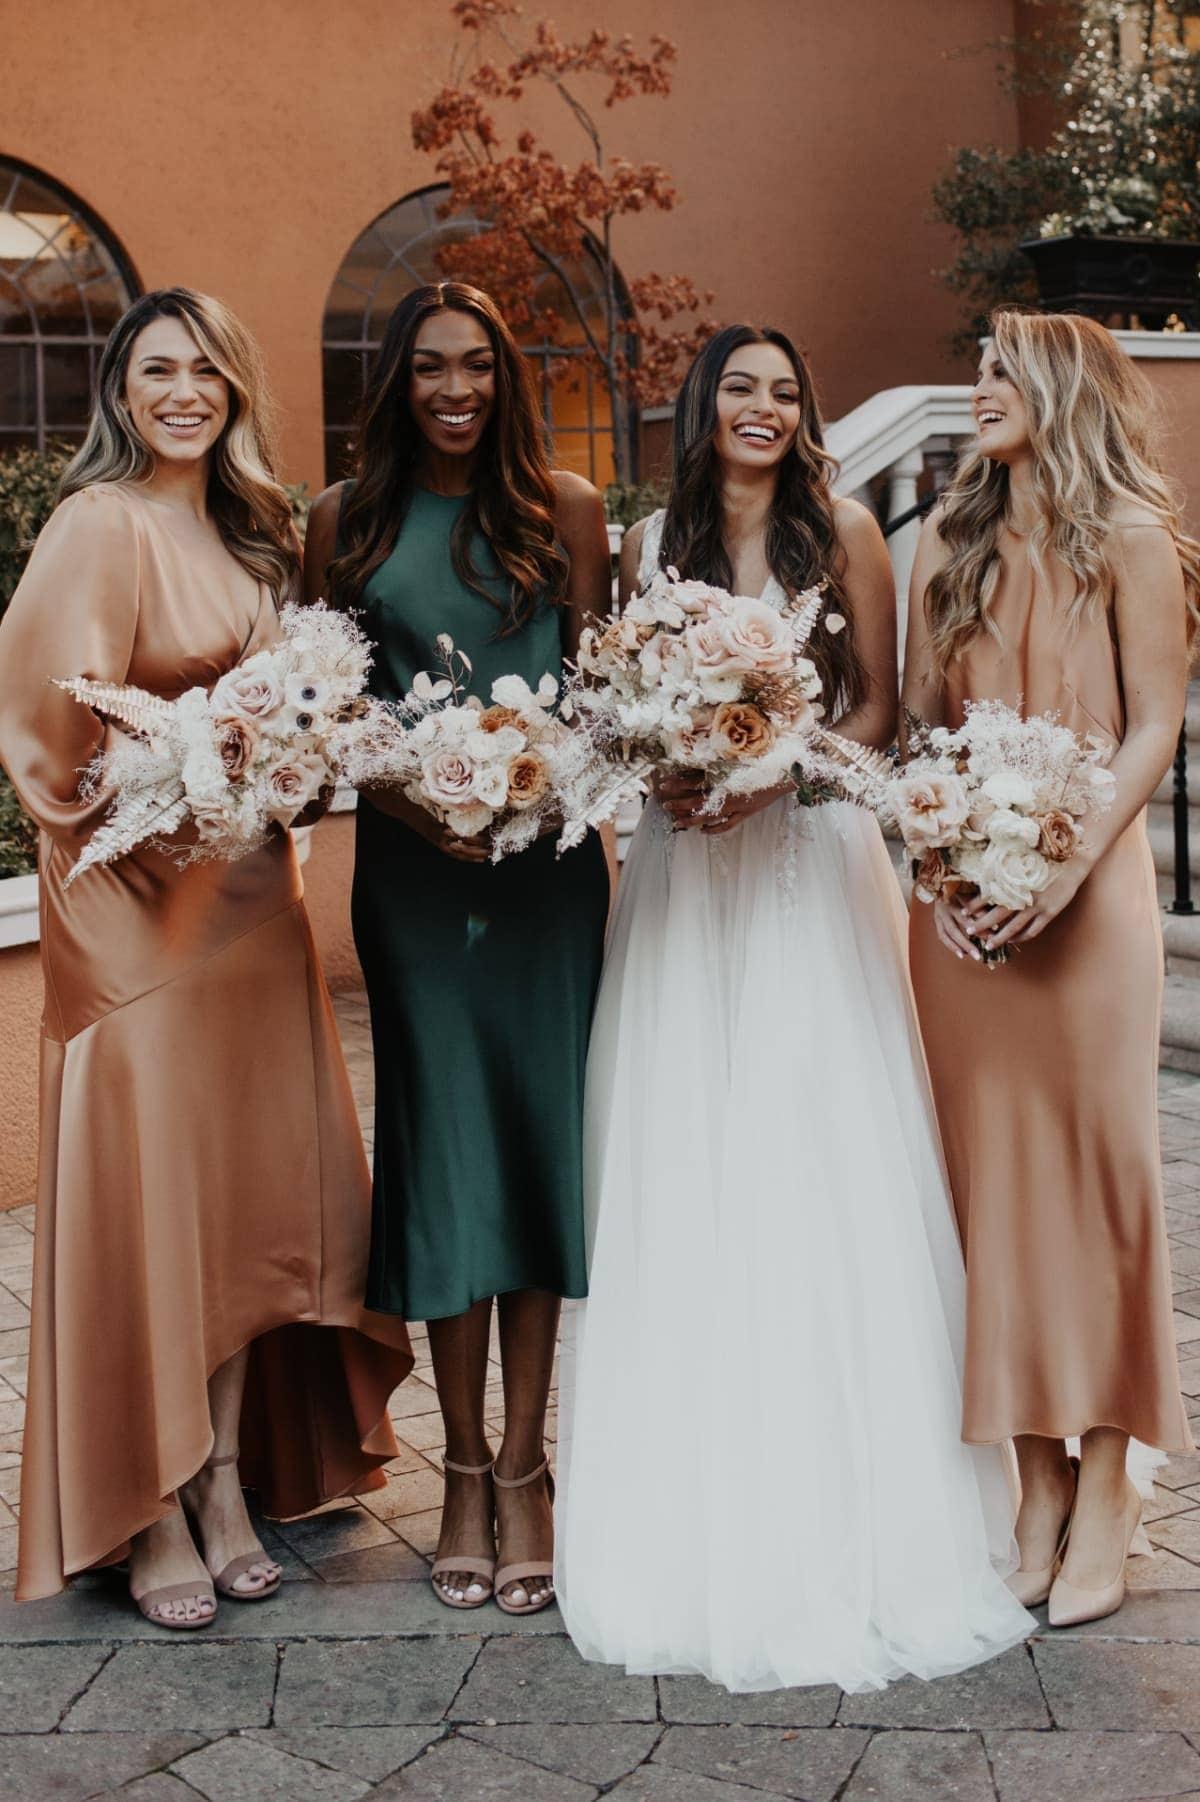 Satin Bridesmaid Dresses   Dress for the Wedding